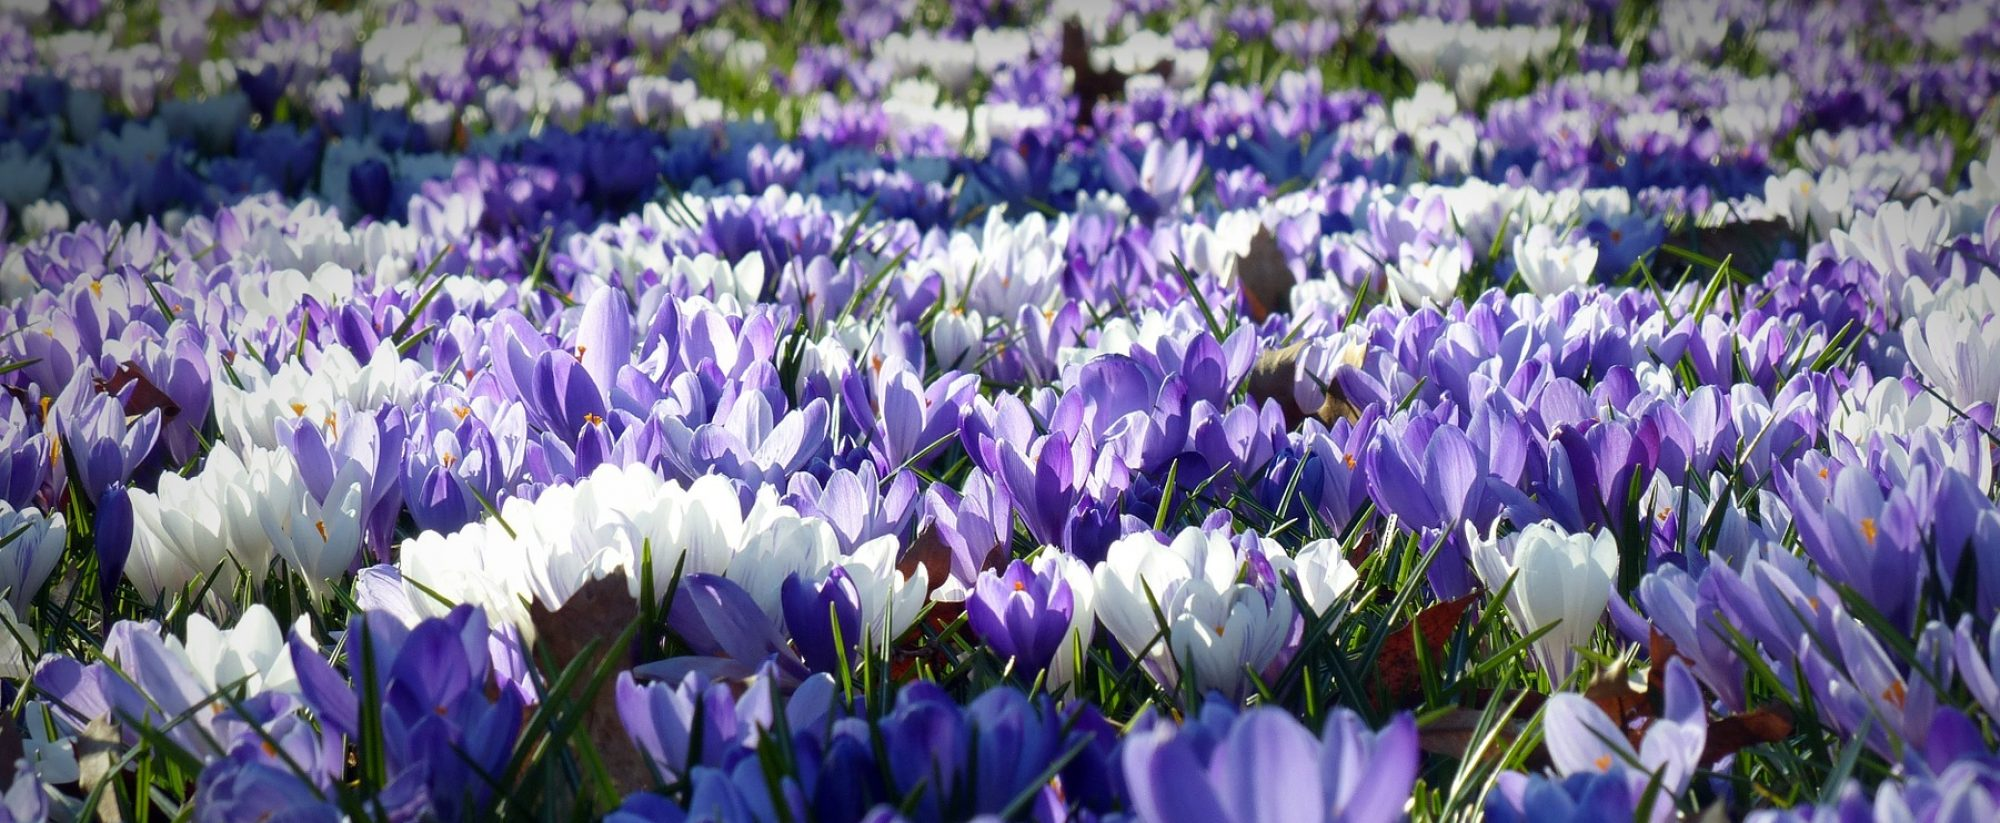 Adachi Florist and Nursery